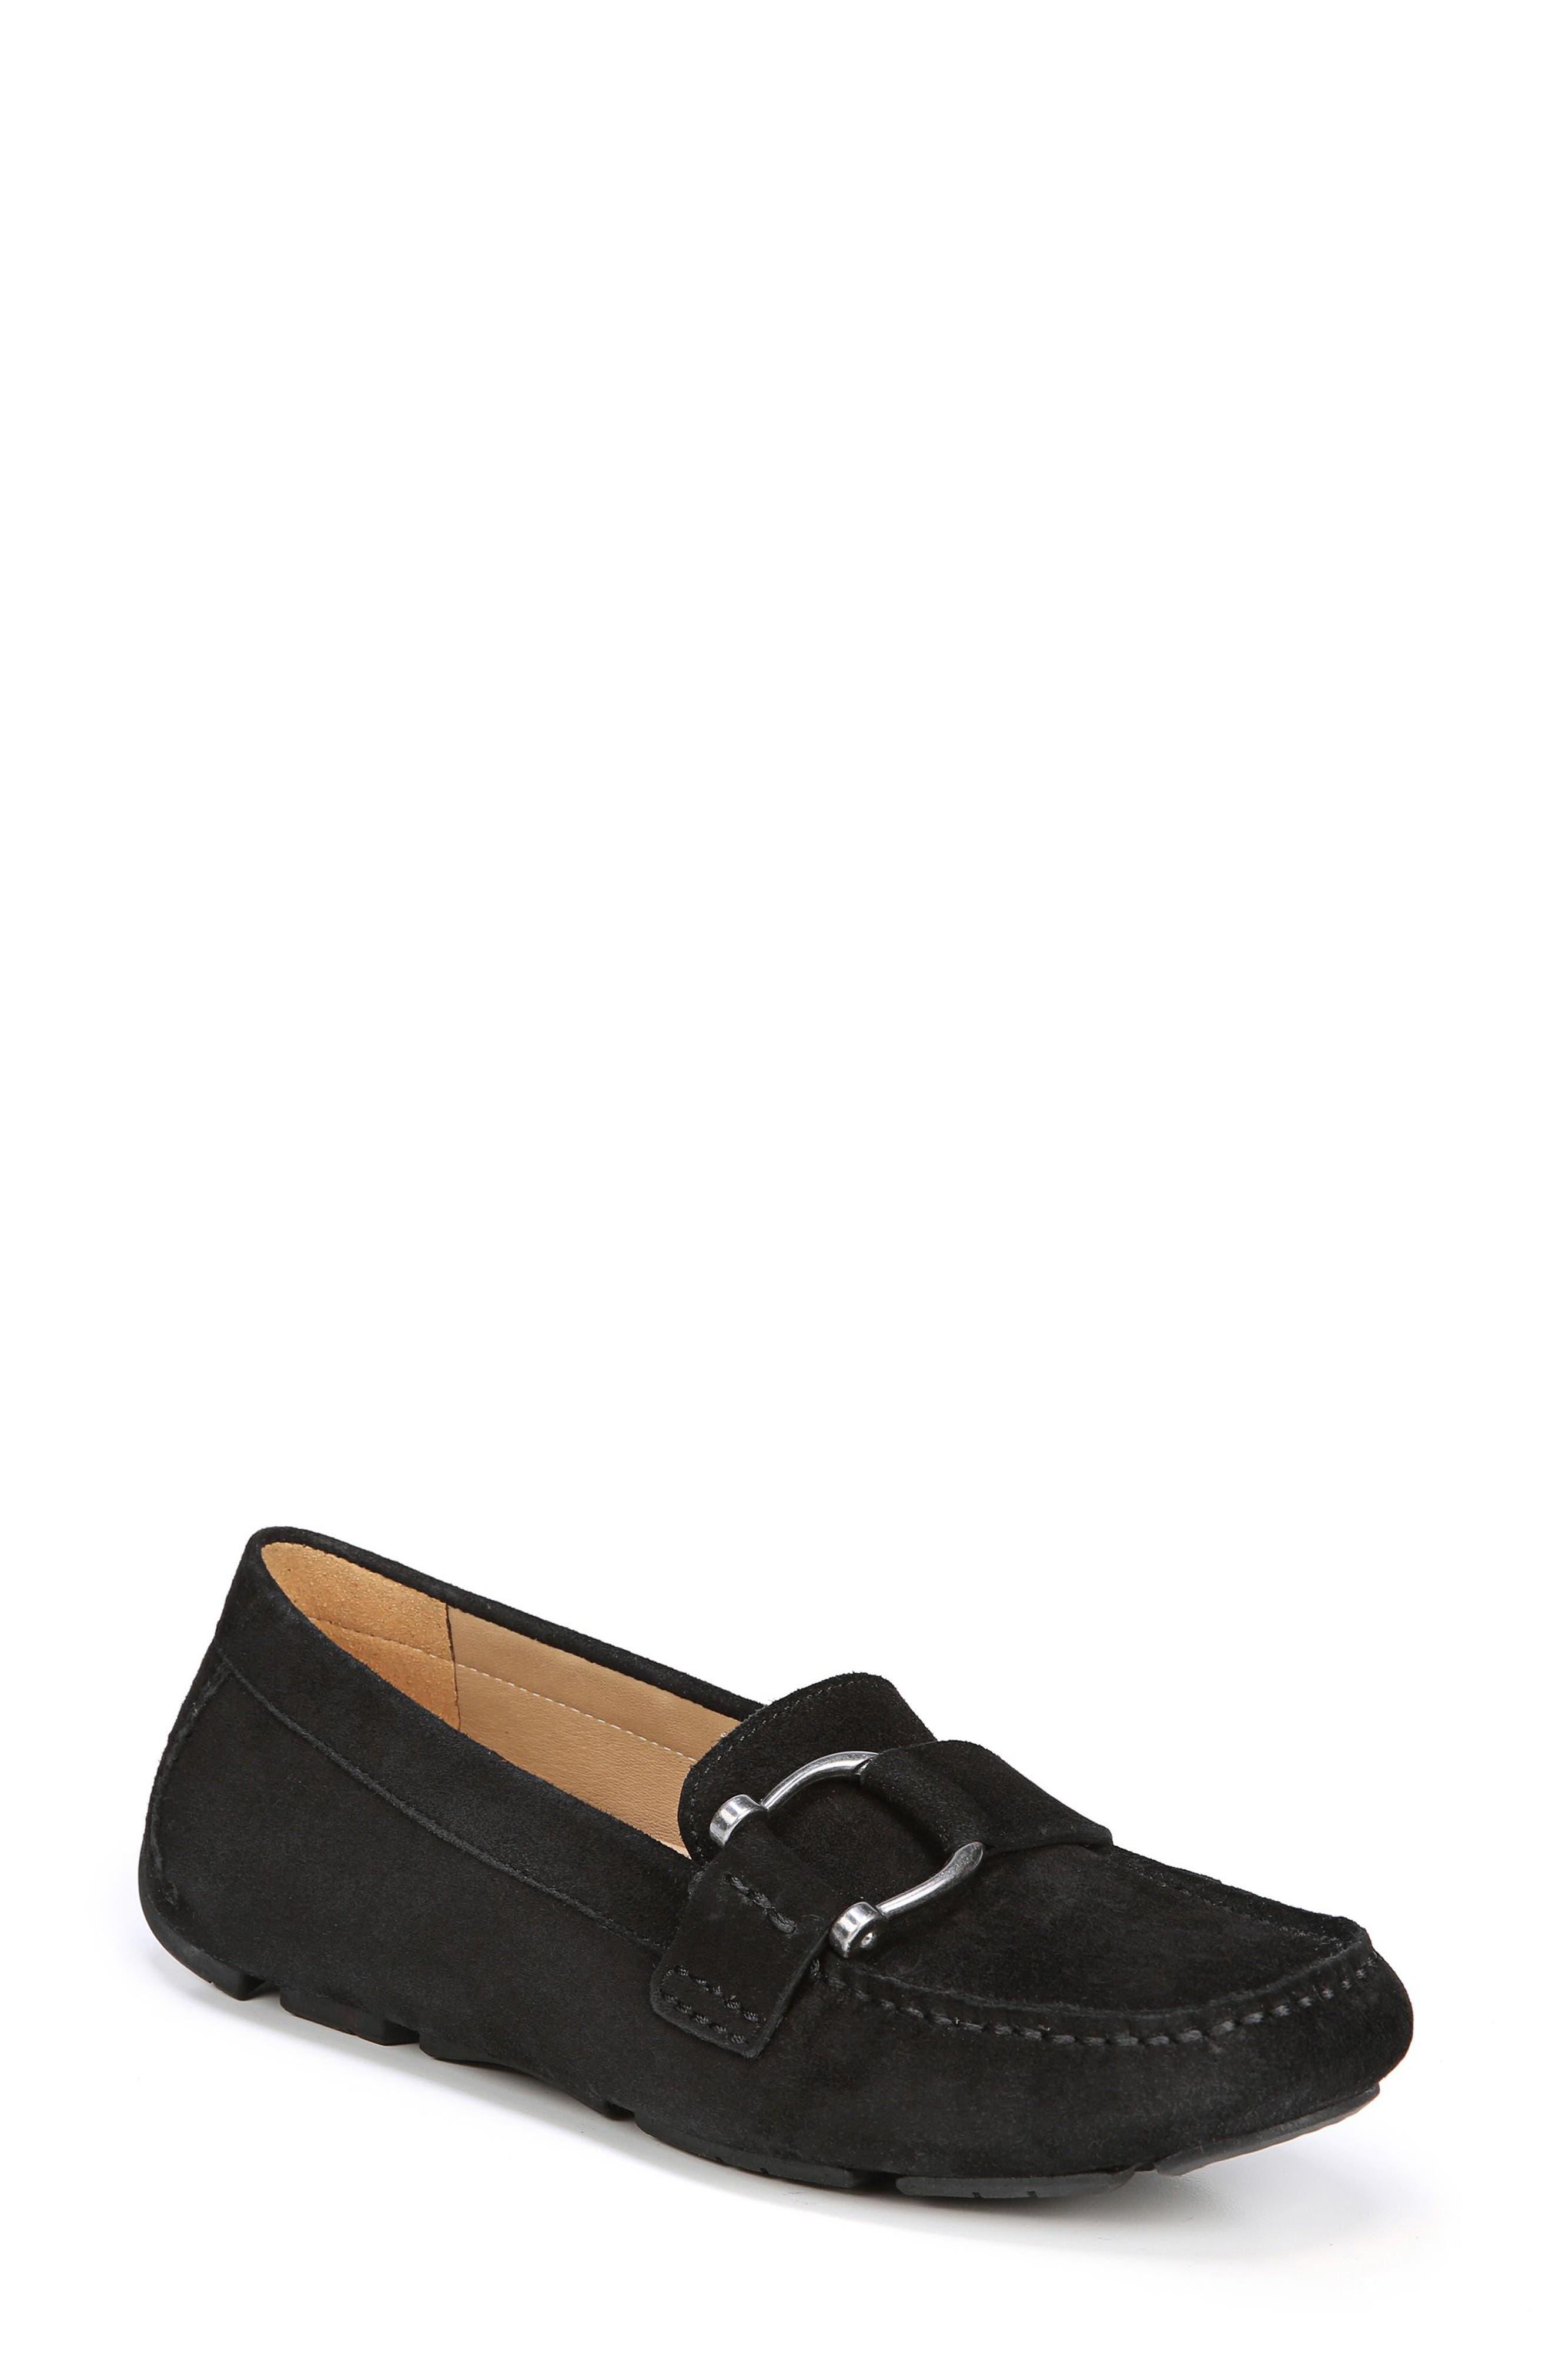 Nara Loafer,                             Main thumbnail 1, color,                             BLACK SUEDE